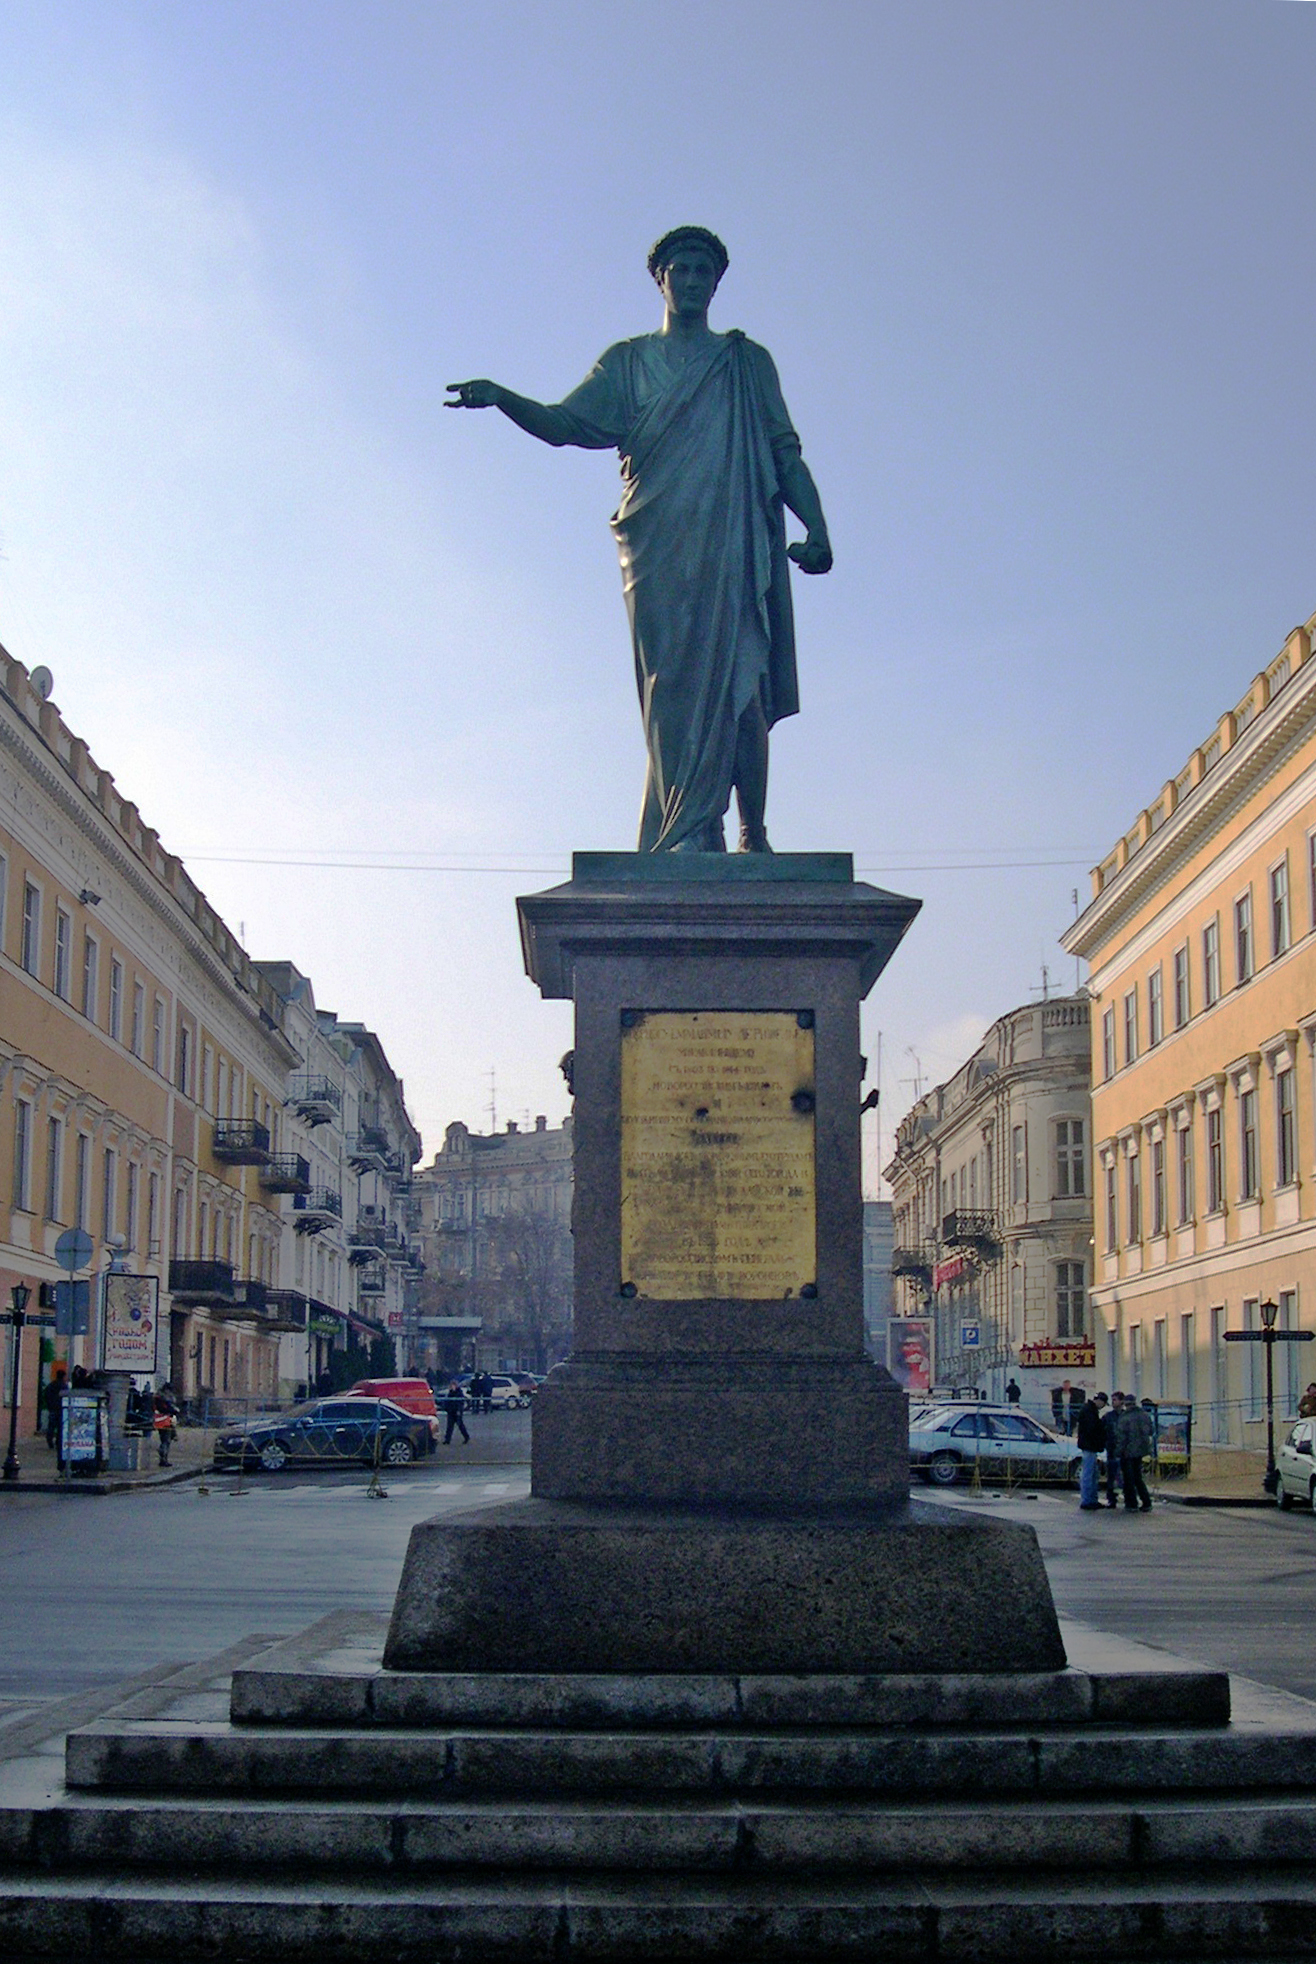 Пам'ятник градоначальнику та генерал-губернатору А. де Рішельє в Одесі